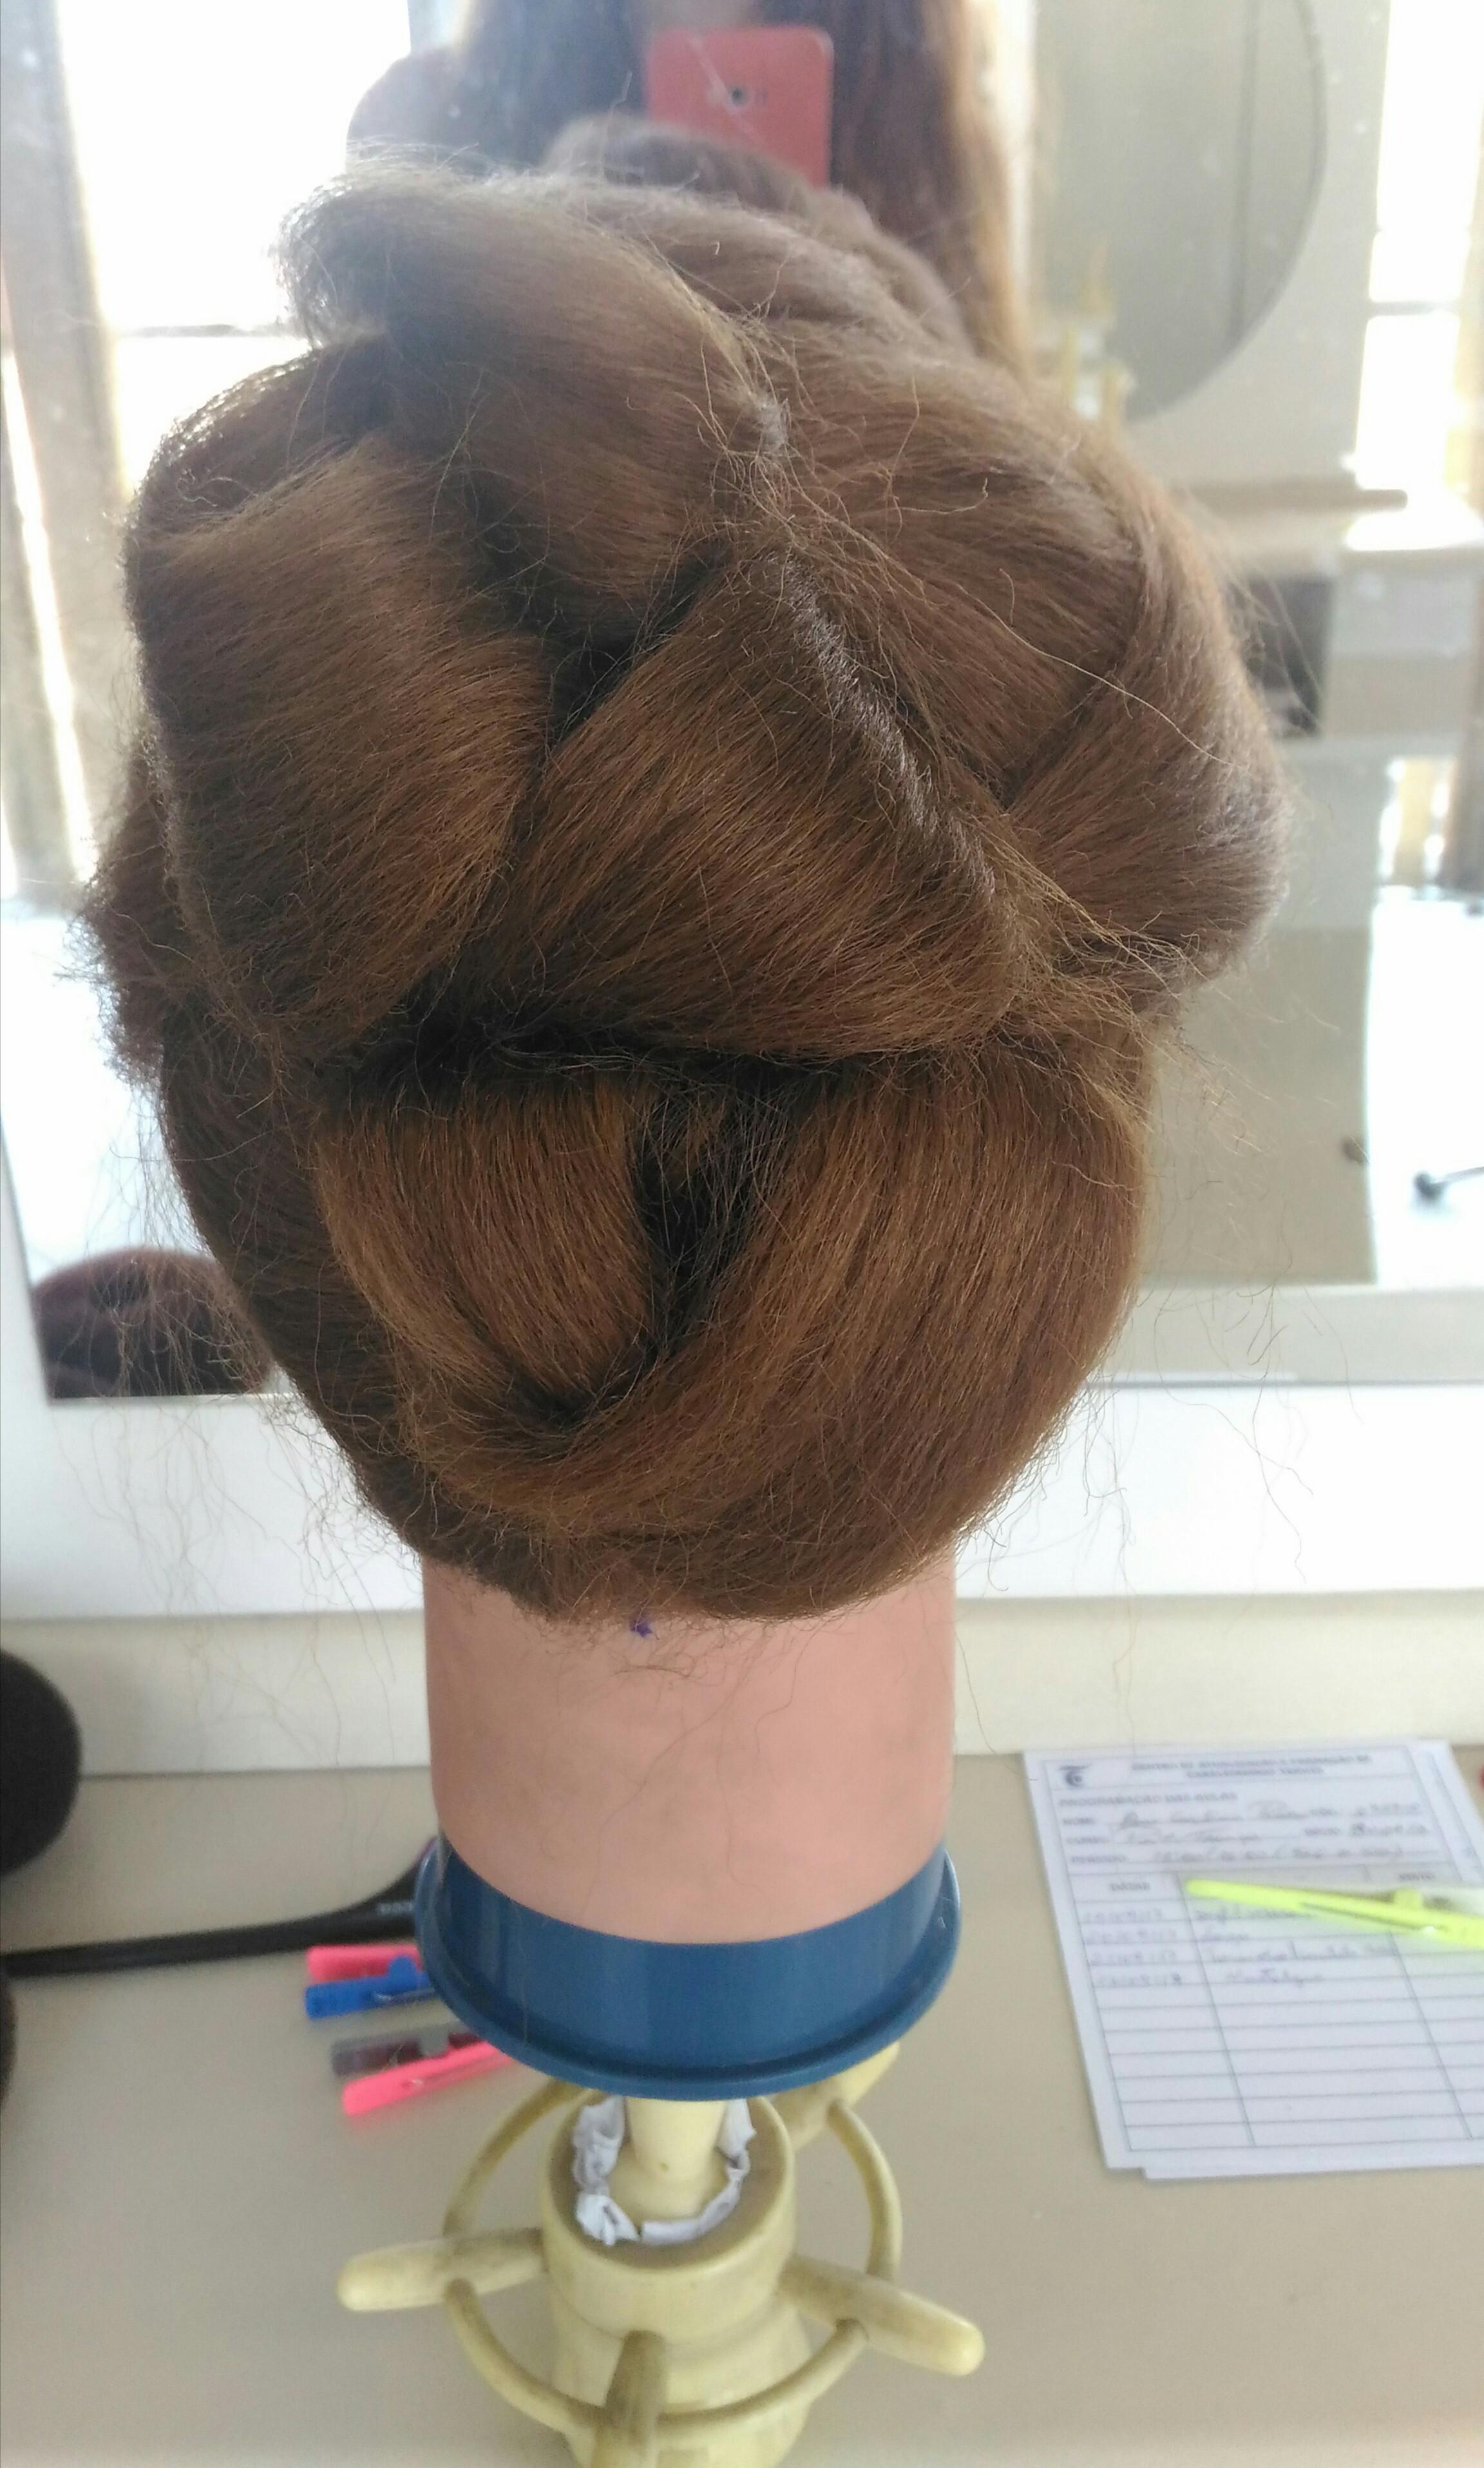 cabelo estudante (esteticista) auxiliar cabeleireiro(a) estudante (designer sobrancelha) barbeiro(a) escovista cabeleireiro(a)